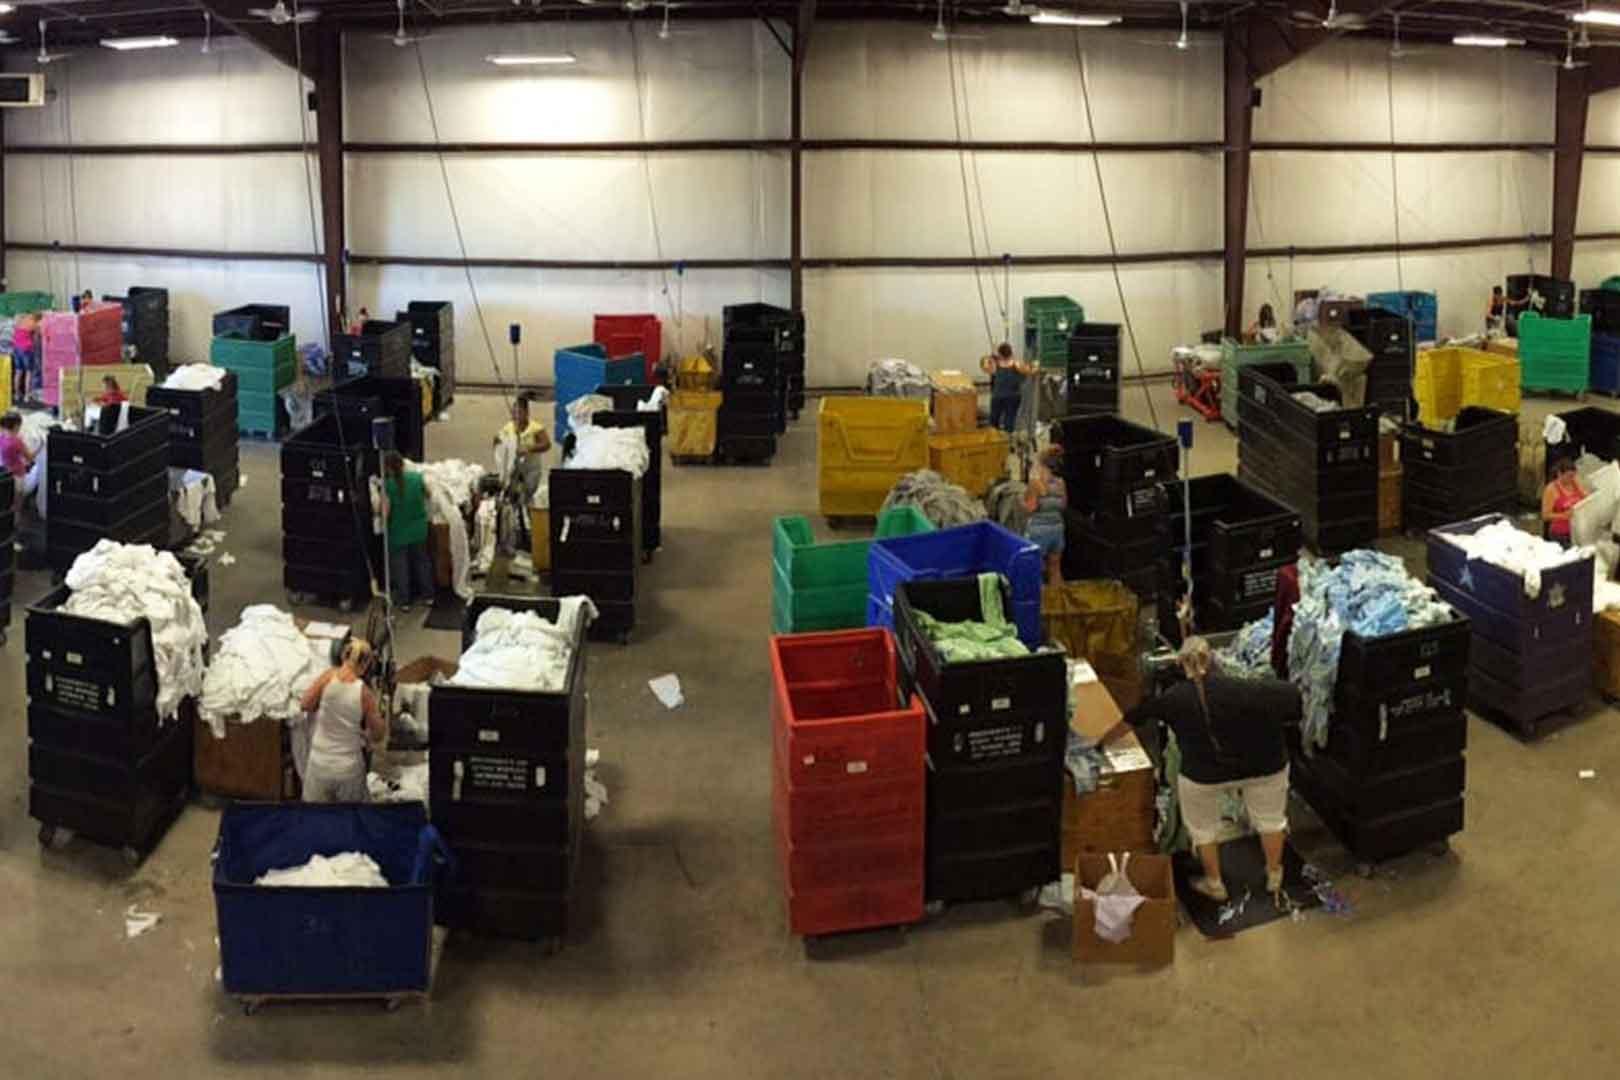 warehouse view of sorting bins